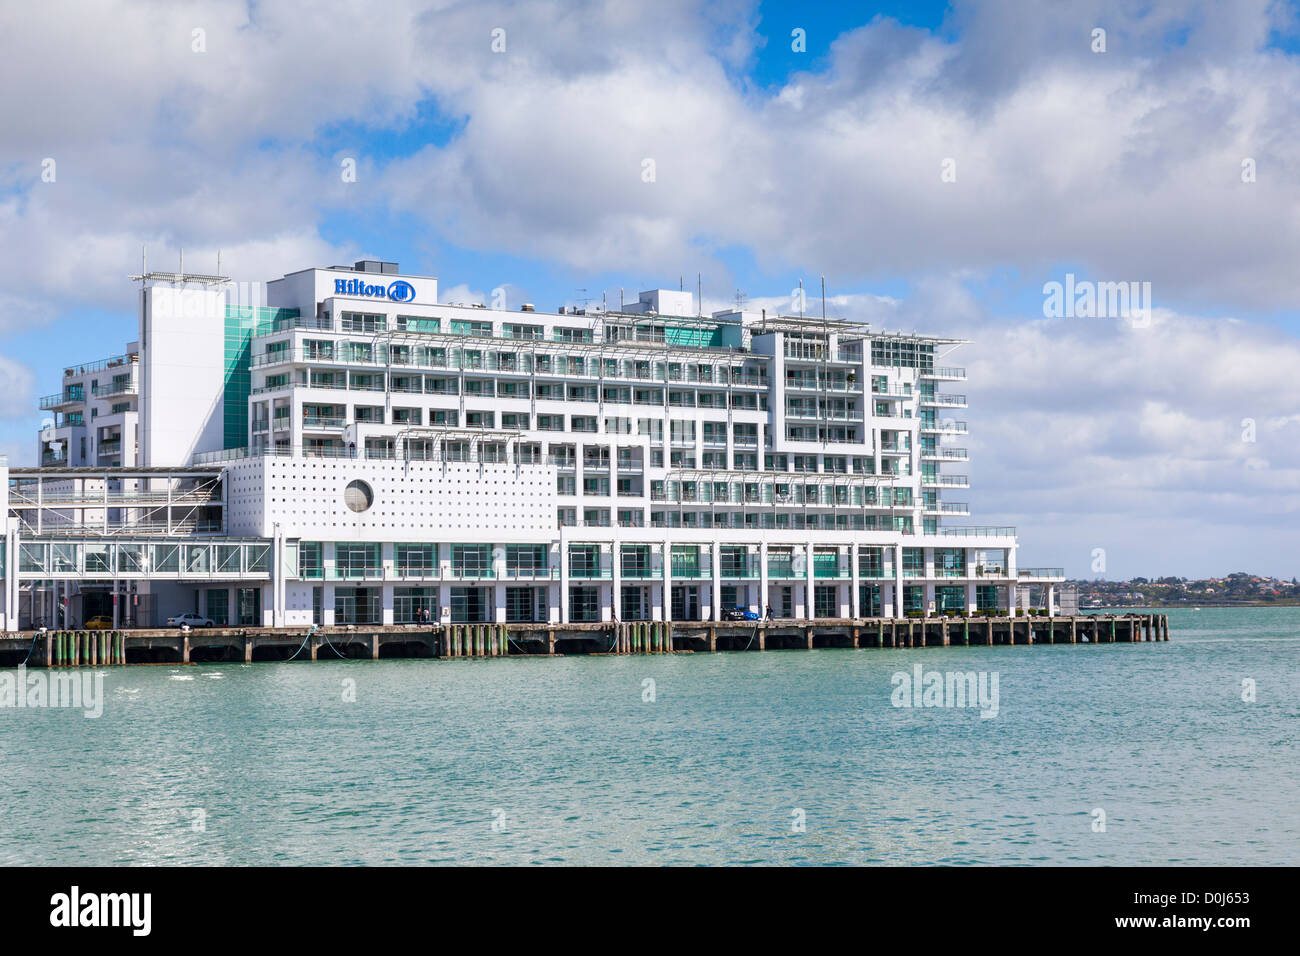 Hilton Hotel, Waitemata Harbour, Auckland, New Zealand. - Stock Image